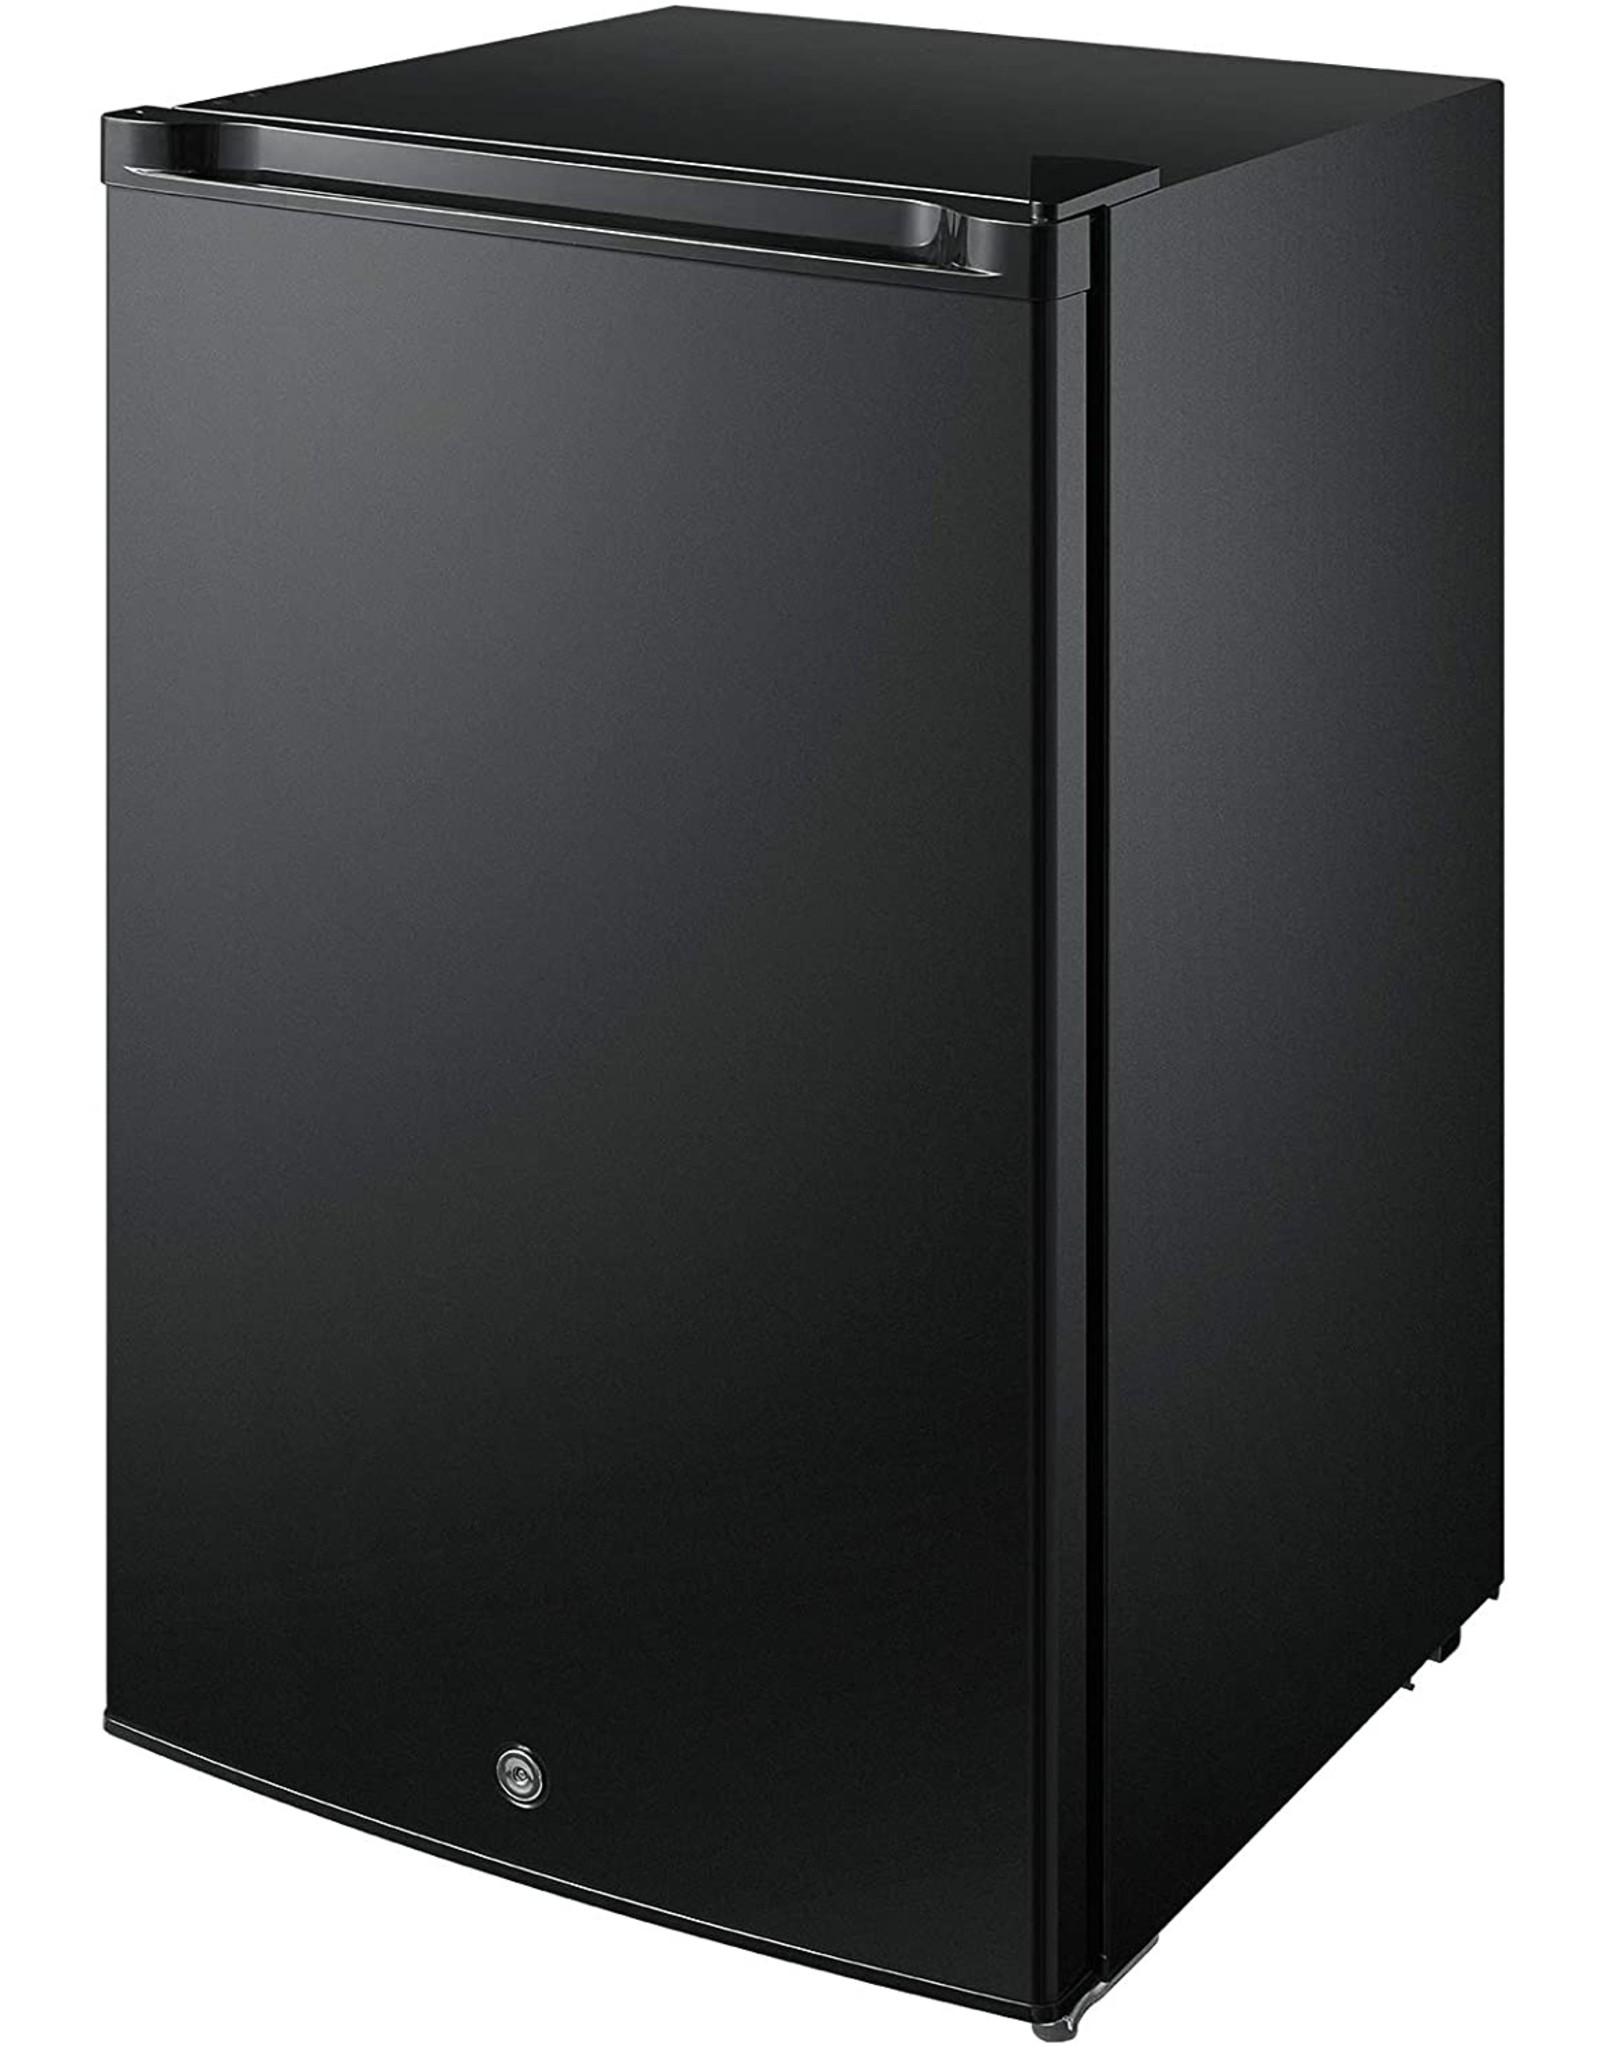 Midea Midea MRU03M2ABB Upright Freezer 3.0 Cubic Feet with Door Lock, Black